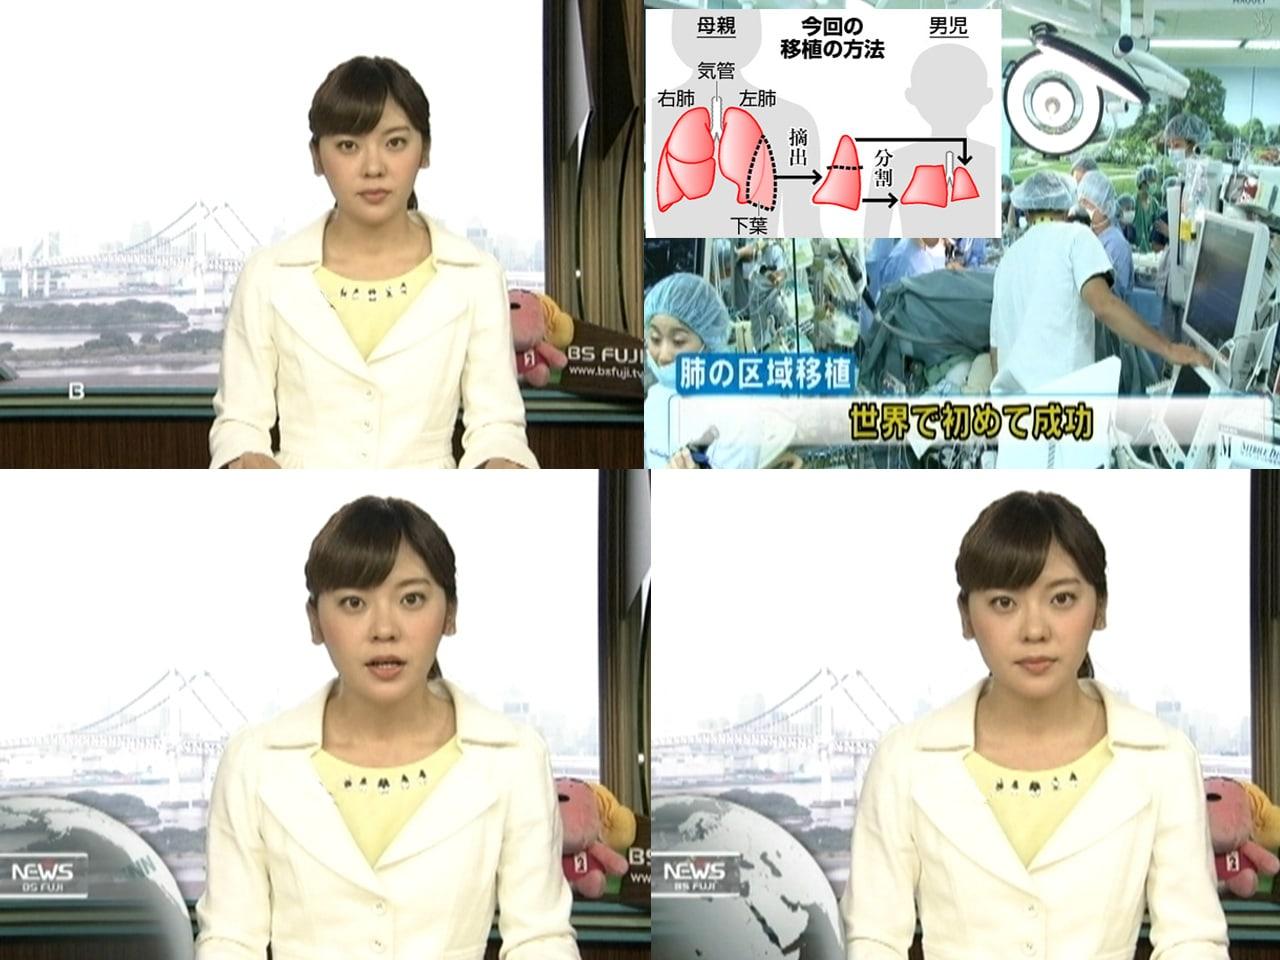 森夏美 (1995年生)の画像 p1_30